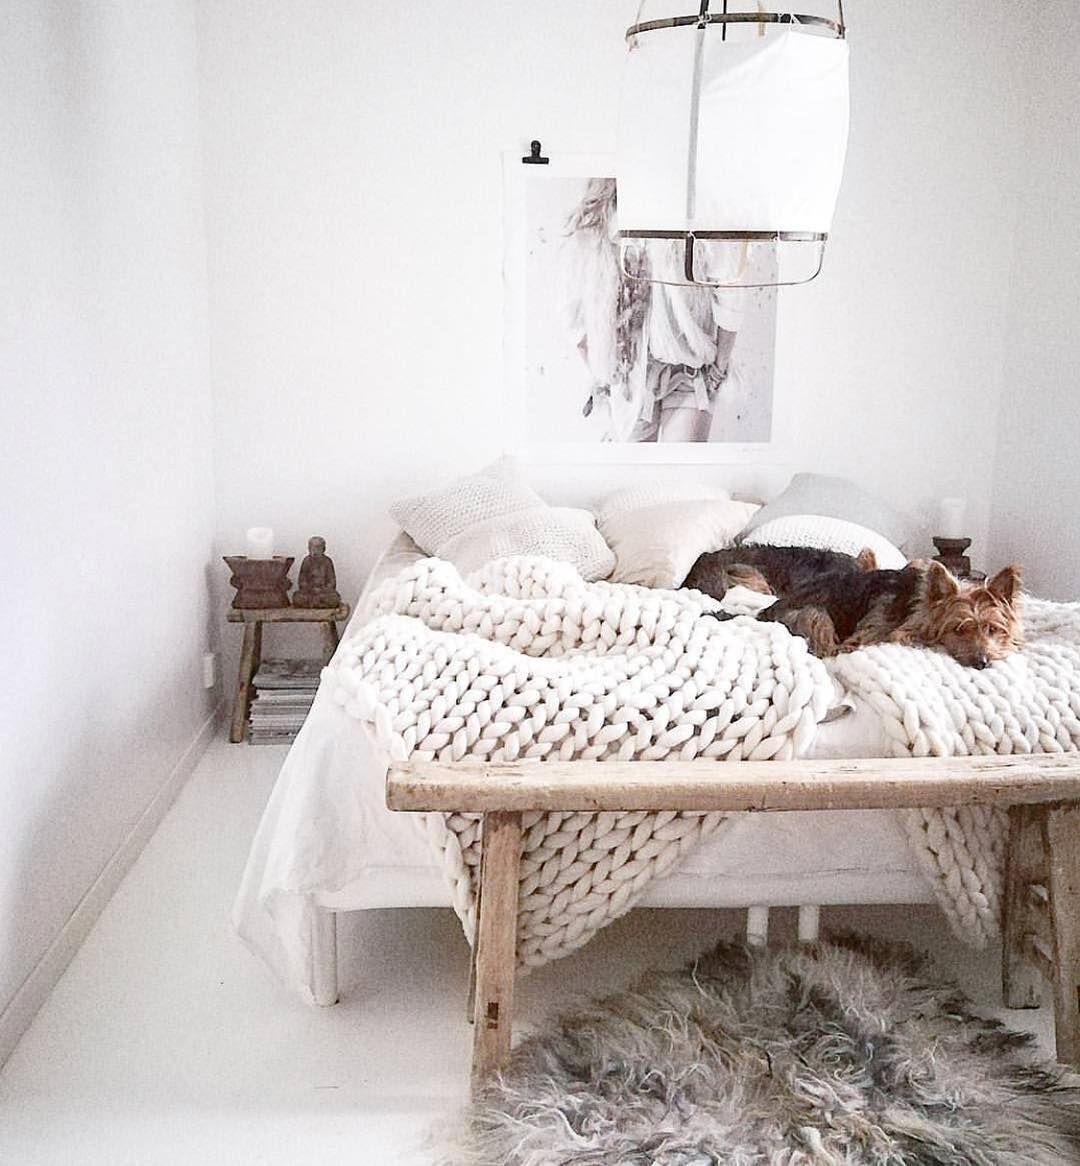 ❤ Dreamy bedrooms on Instagram • photo © @bypias #bedroom ...